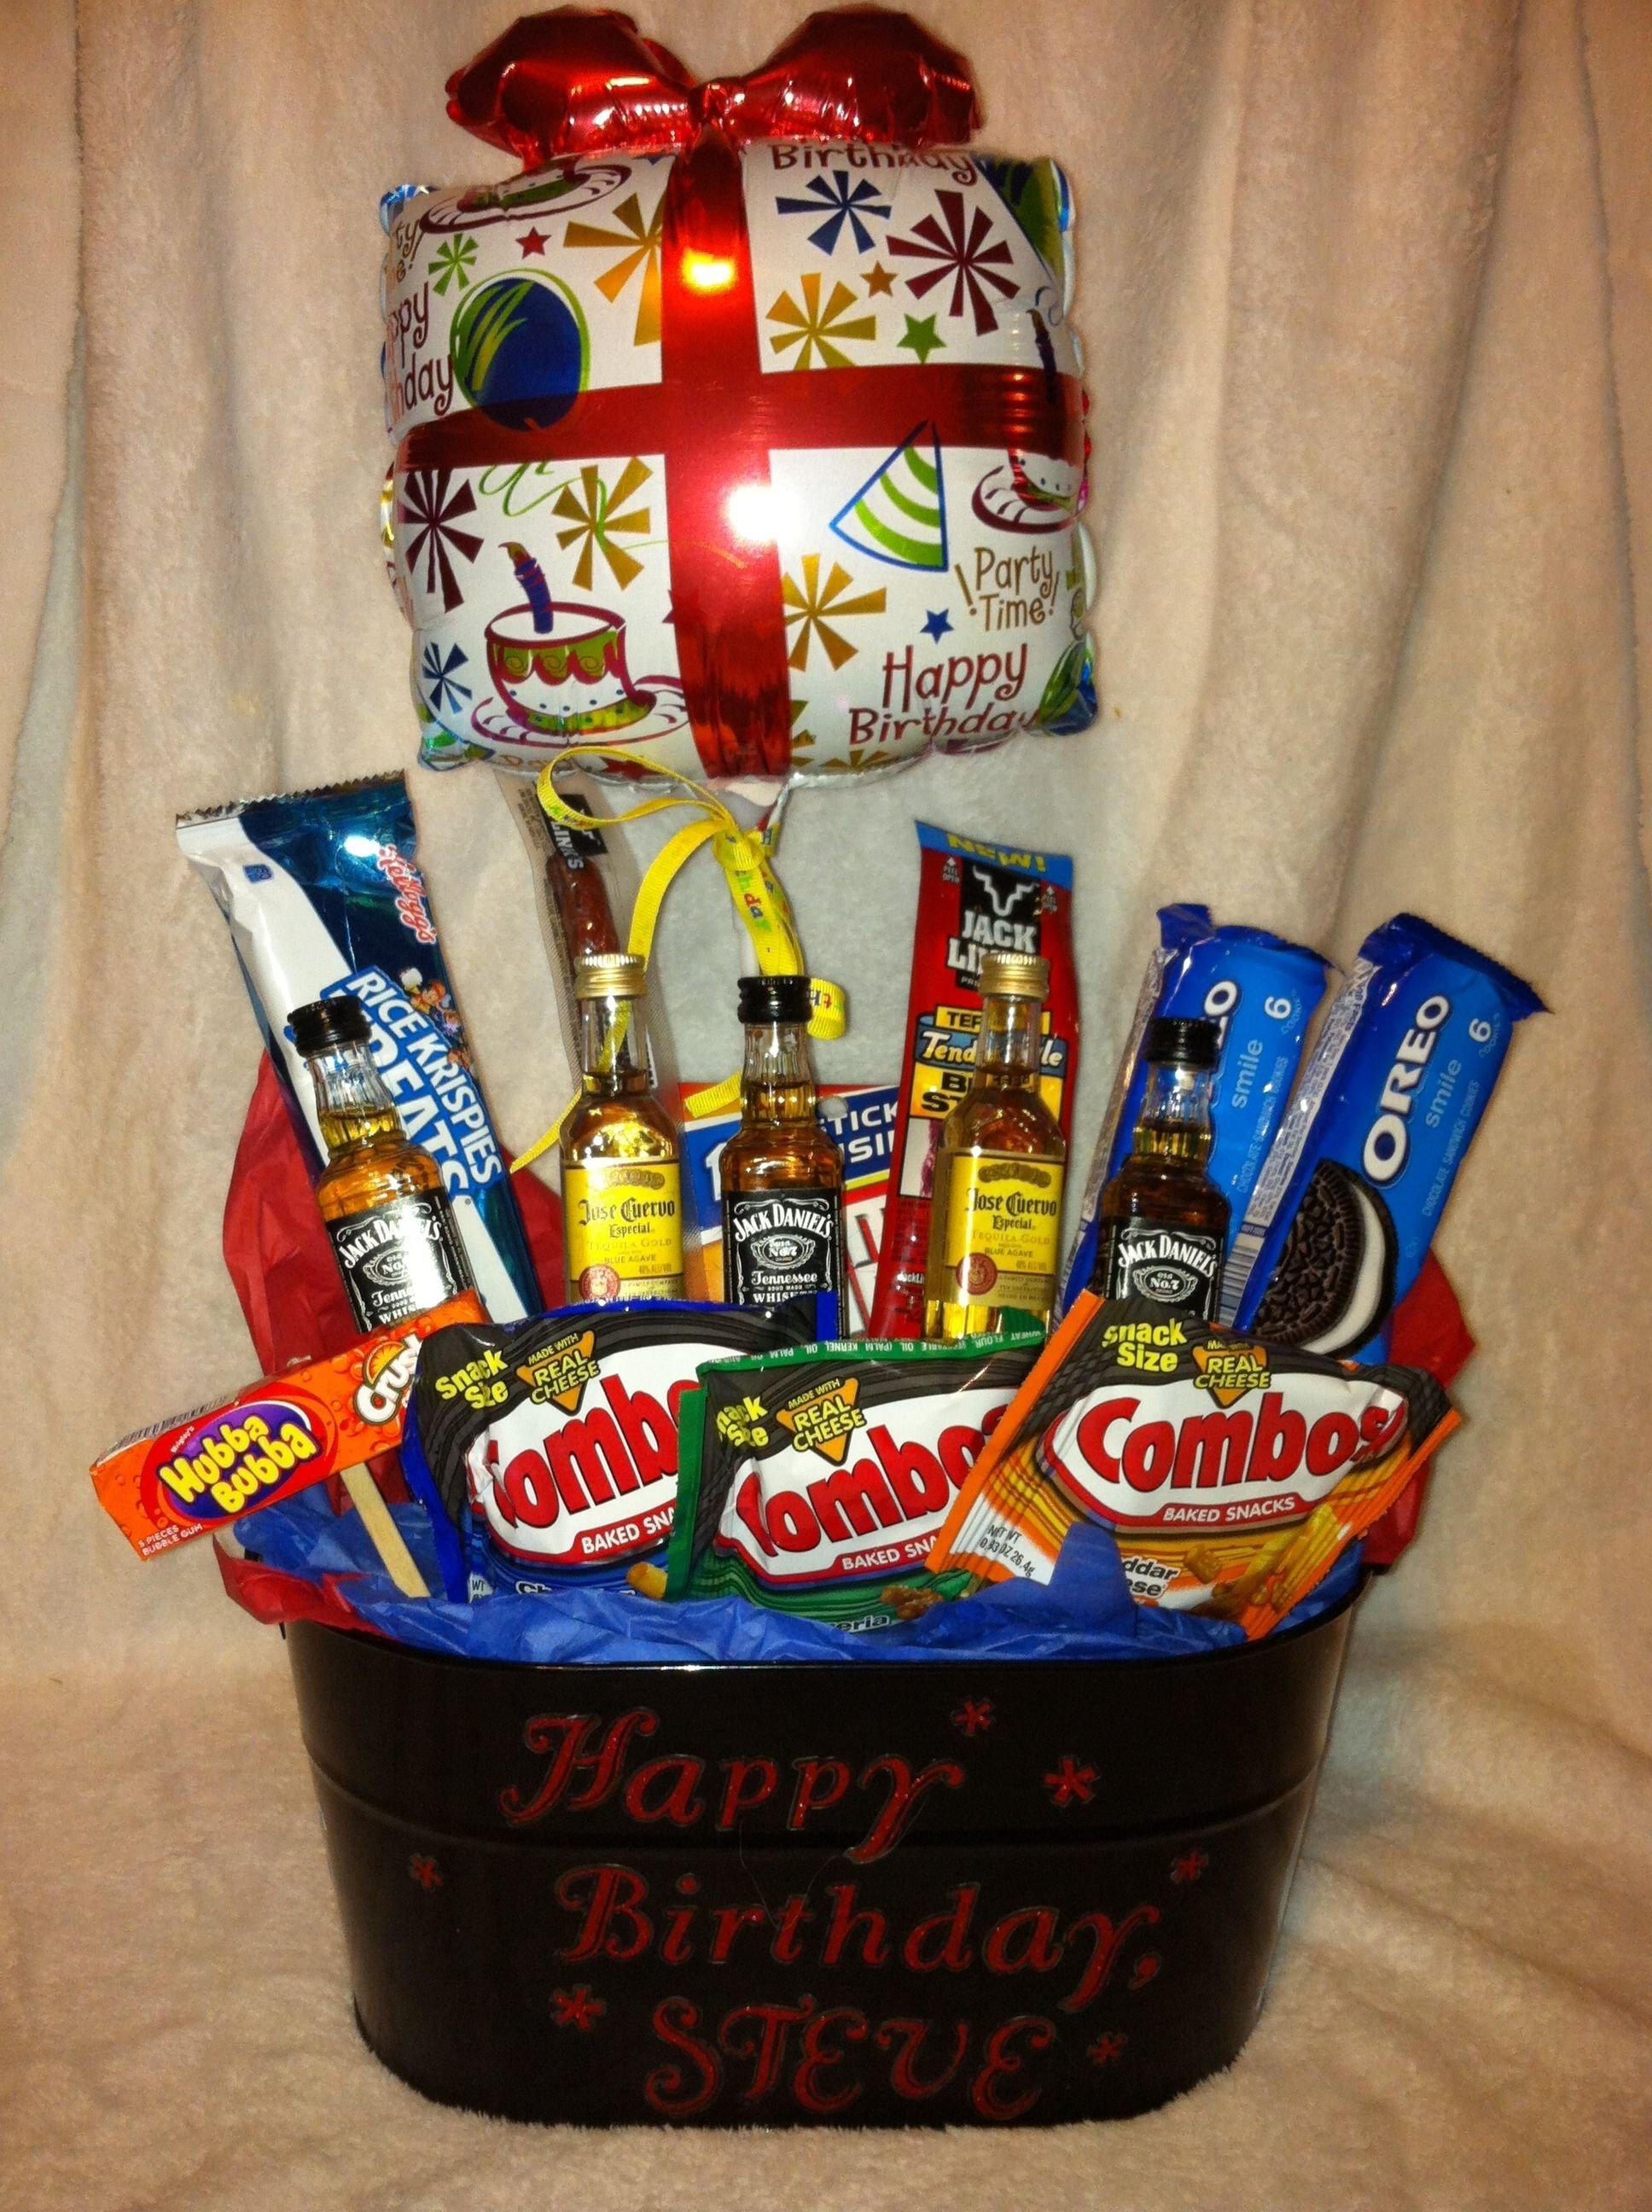 10 Fantastic Special Birthday Ideas For Him birthday gift basket for him gift stuff pinterest birthday 1 2021